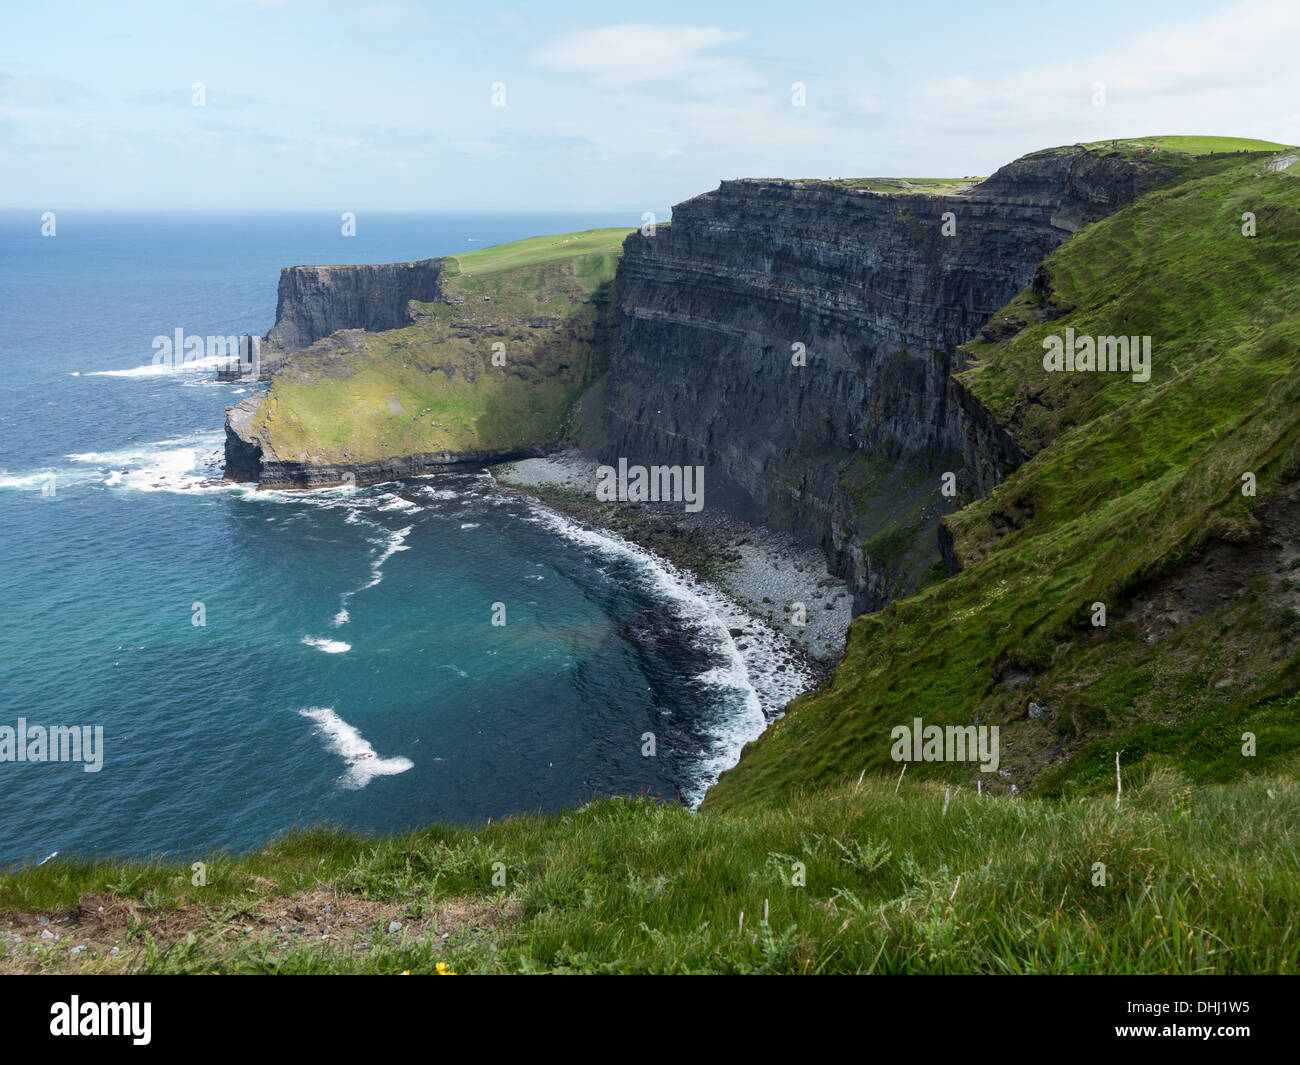 Ireland coast - Cliffs of Moher in South Western Ireland in Burren Region of County Clare - Stock Image